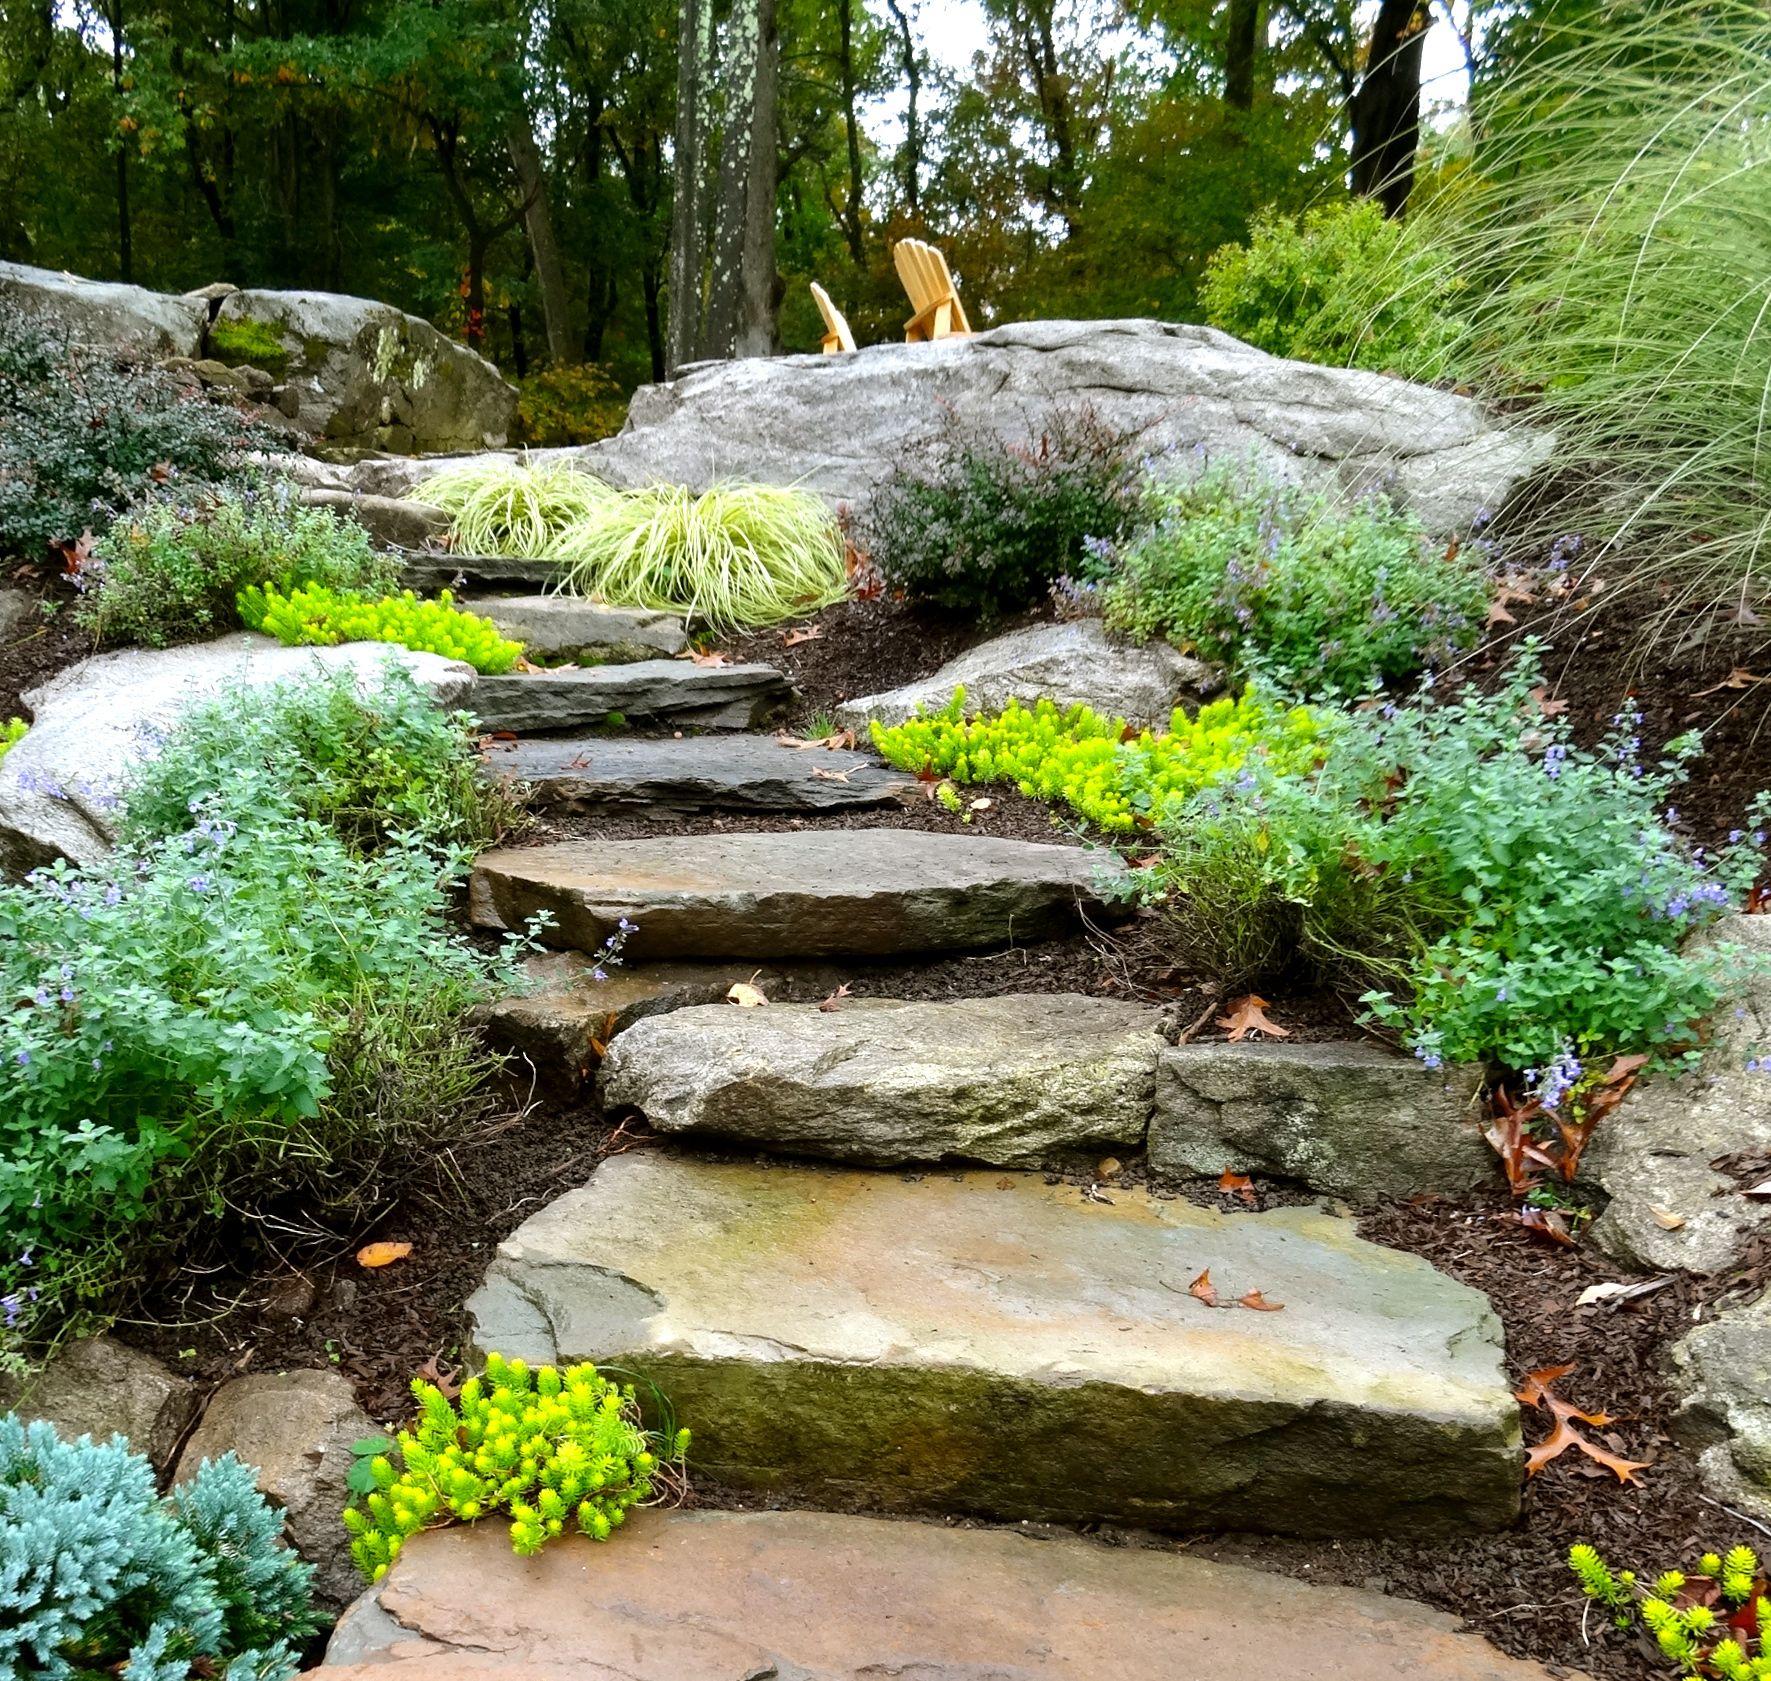 Pin By Linda Klingmann On Jennifer Anderson Design Development Landscaping With Rocks Backyard Sitting Areas Wooden Garden Planters